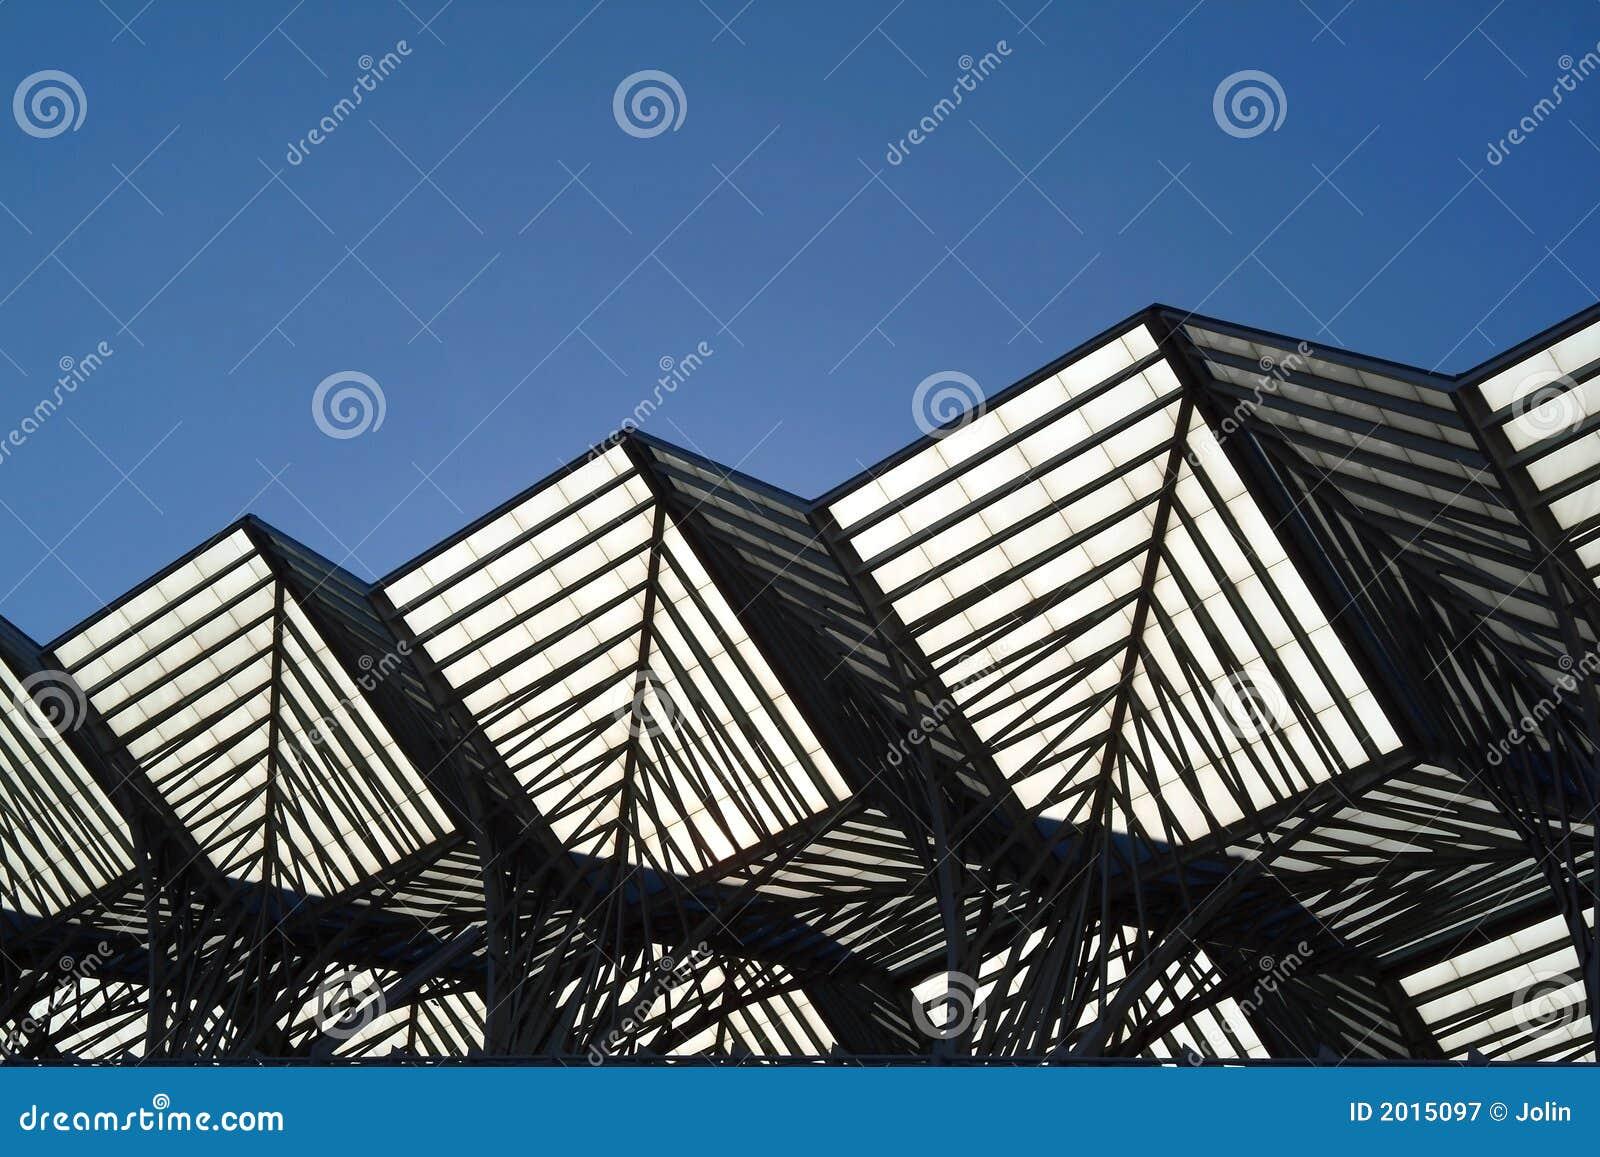 Geometric Metallic Building Stock Image Image 2015097